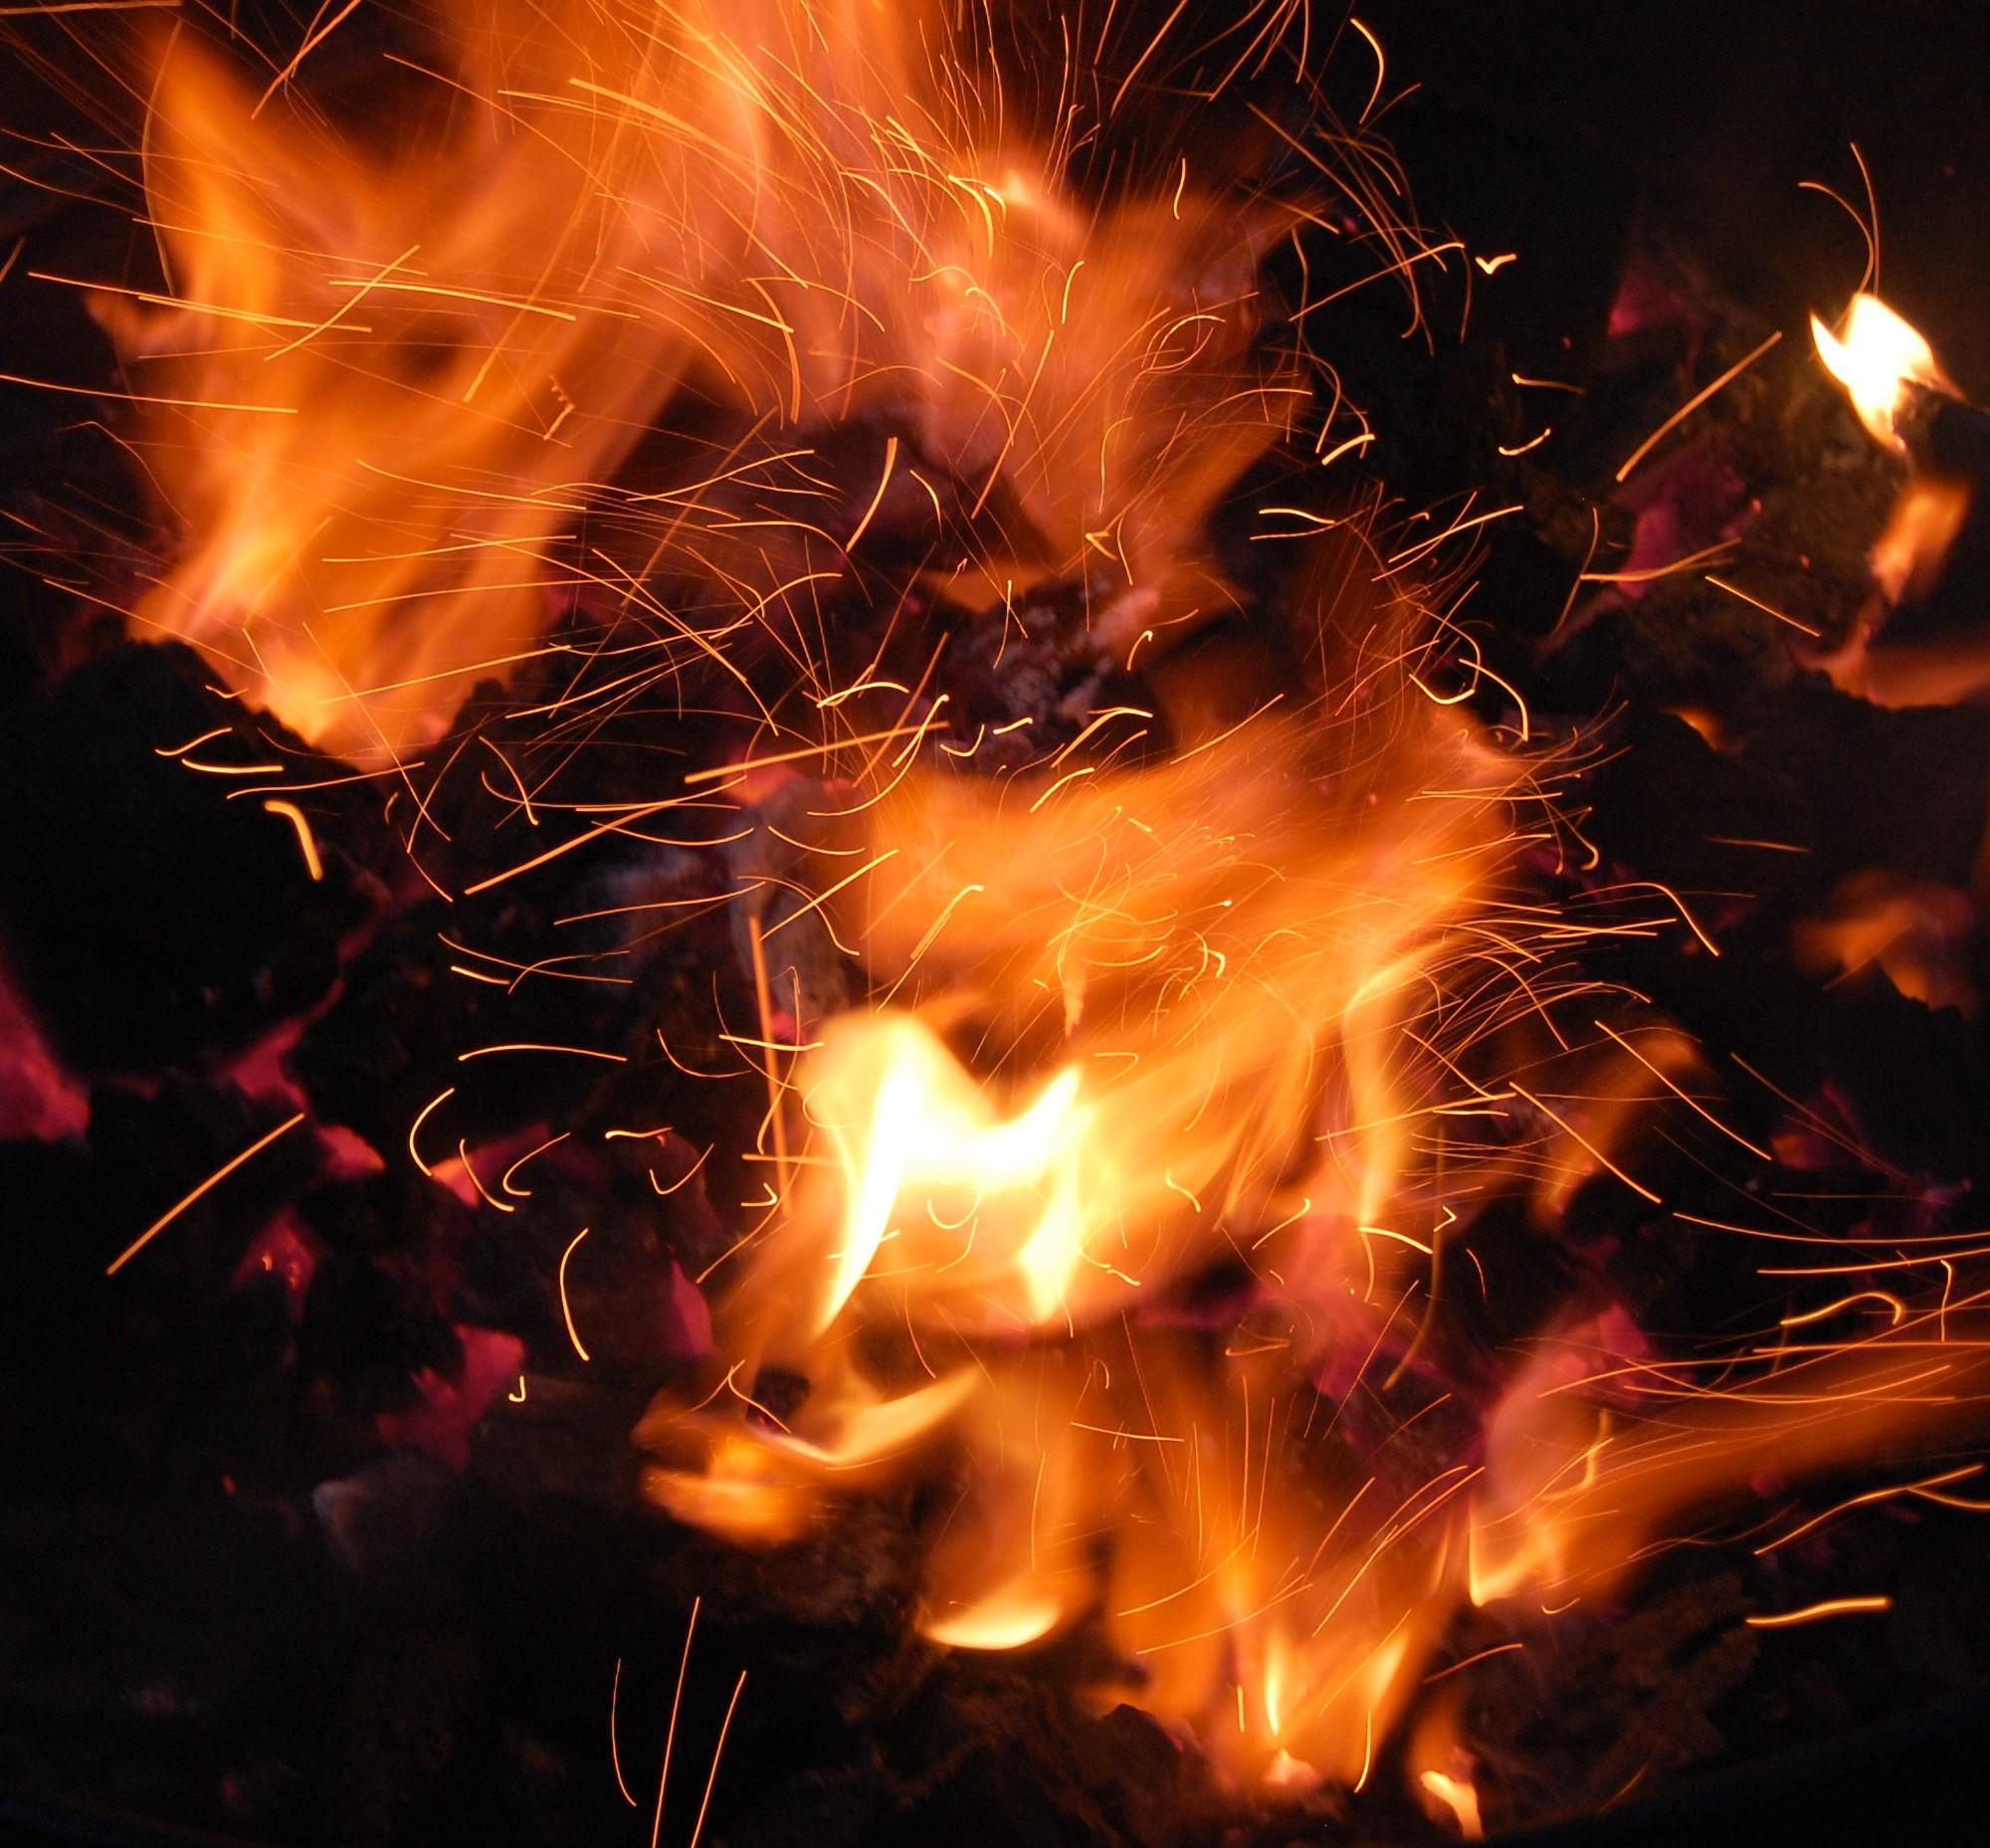 957946 22621024 e1398433507412 - Podobenství o požáru v hotelu